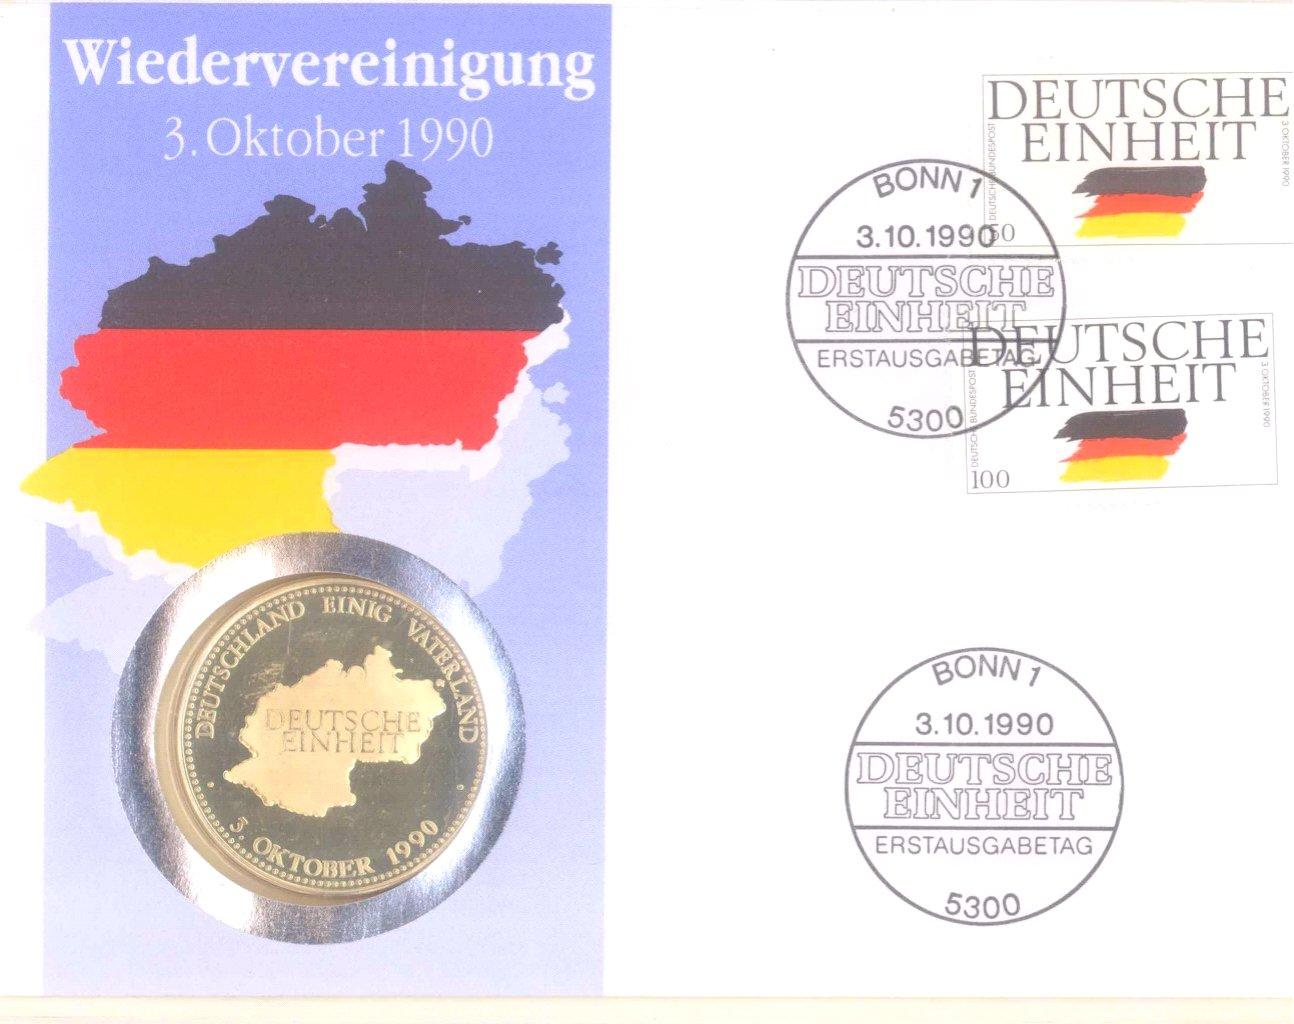 Sammlung Borek Numisbriefe im Ringbinder-4